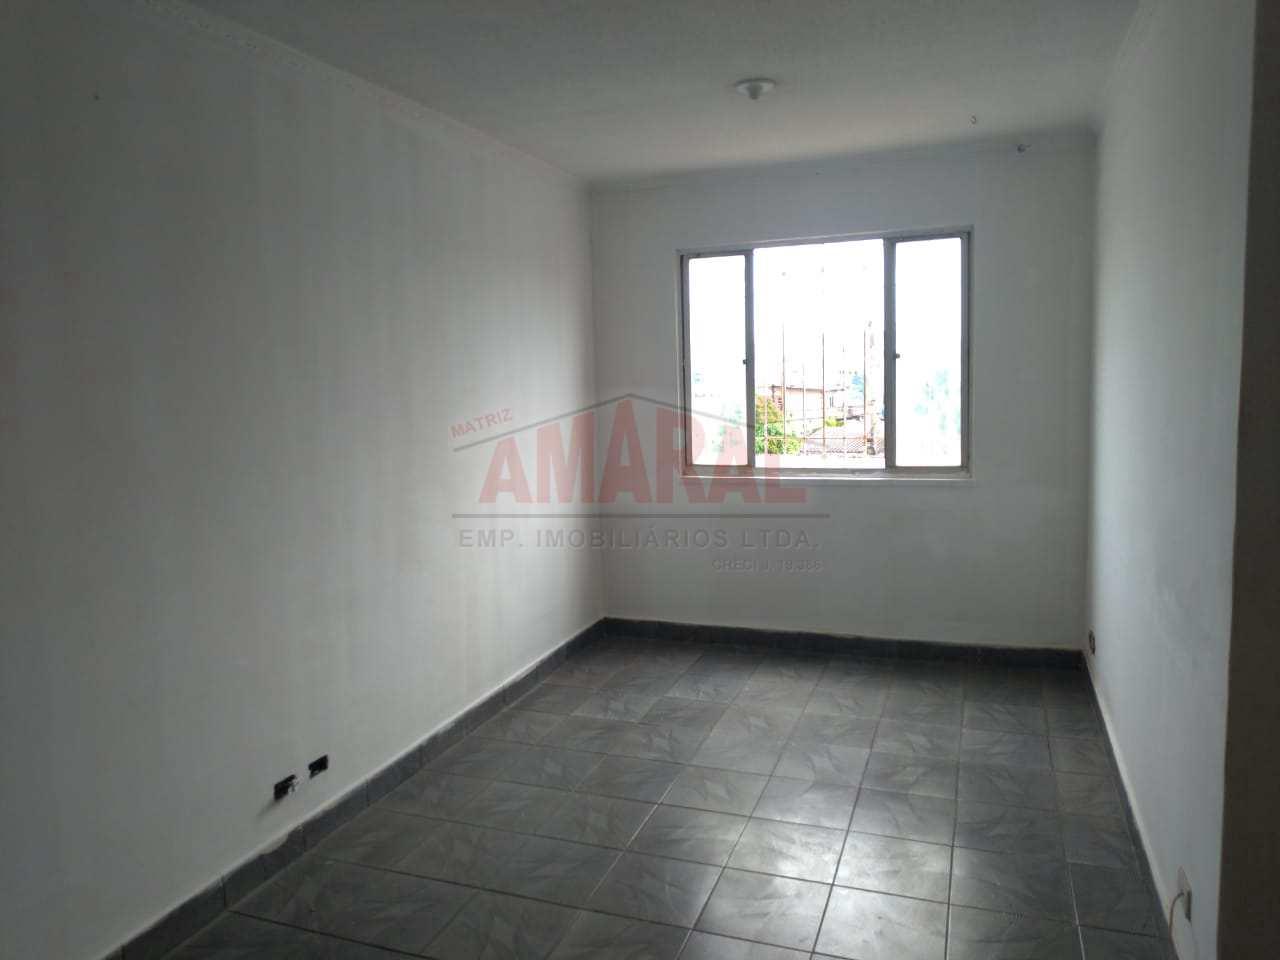 Apartamento com 2 dorms, Cidade Satélite Santa Bárbara, São Paulo - R$ 150 mil, Cod: 11297